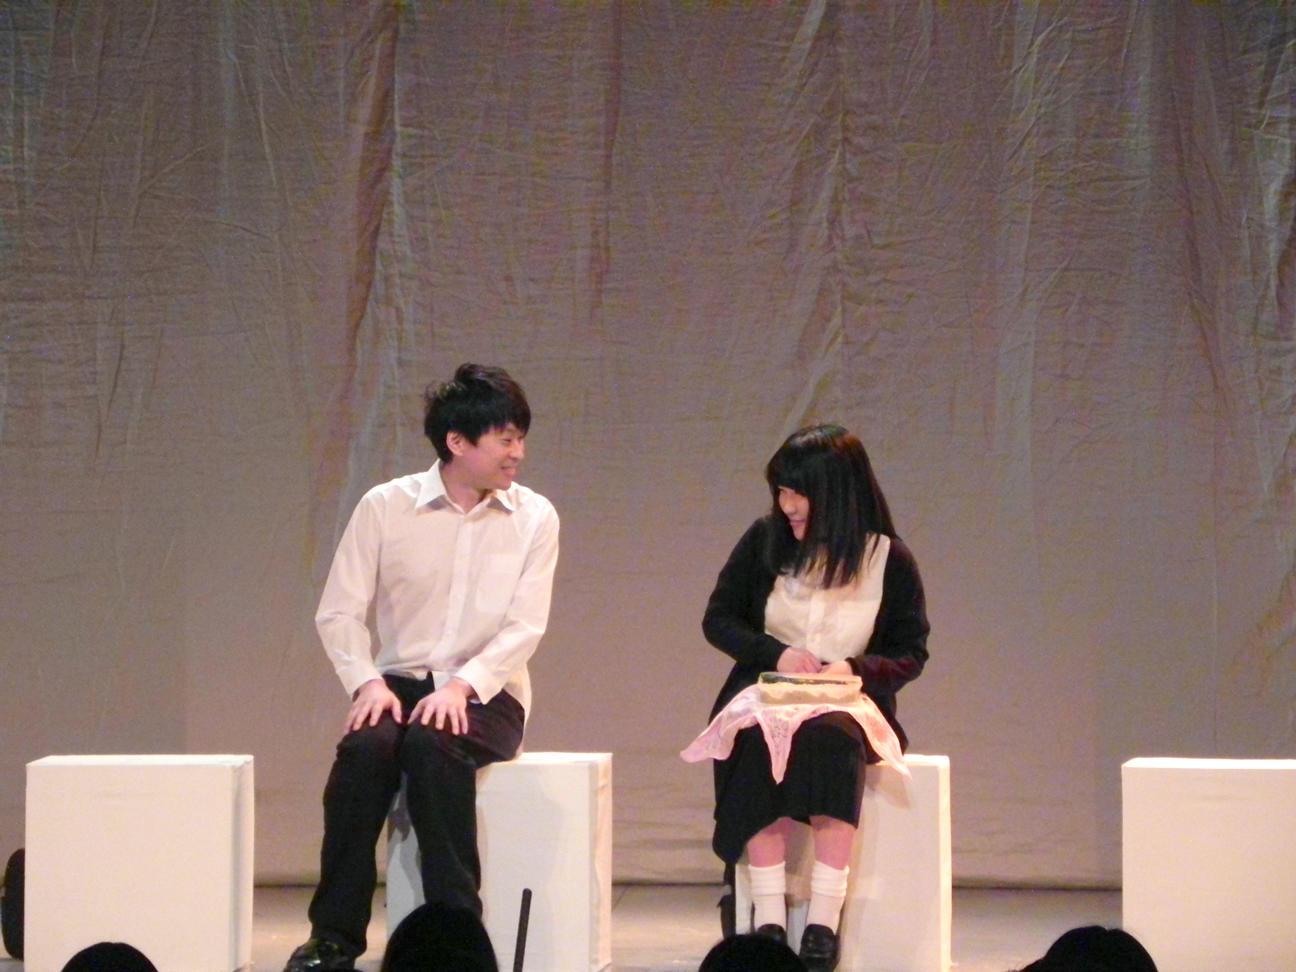 http://news.yoshimoto.co.jp/20170228123839-b5535c10b541434274347f8c2fe565db34acfabc.jpg